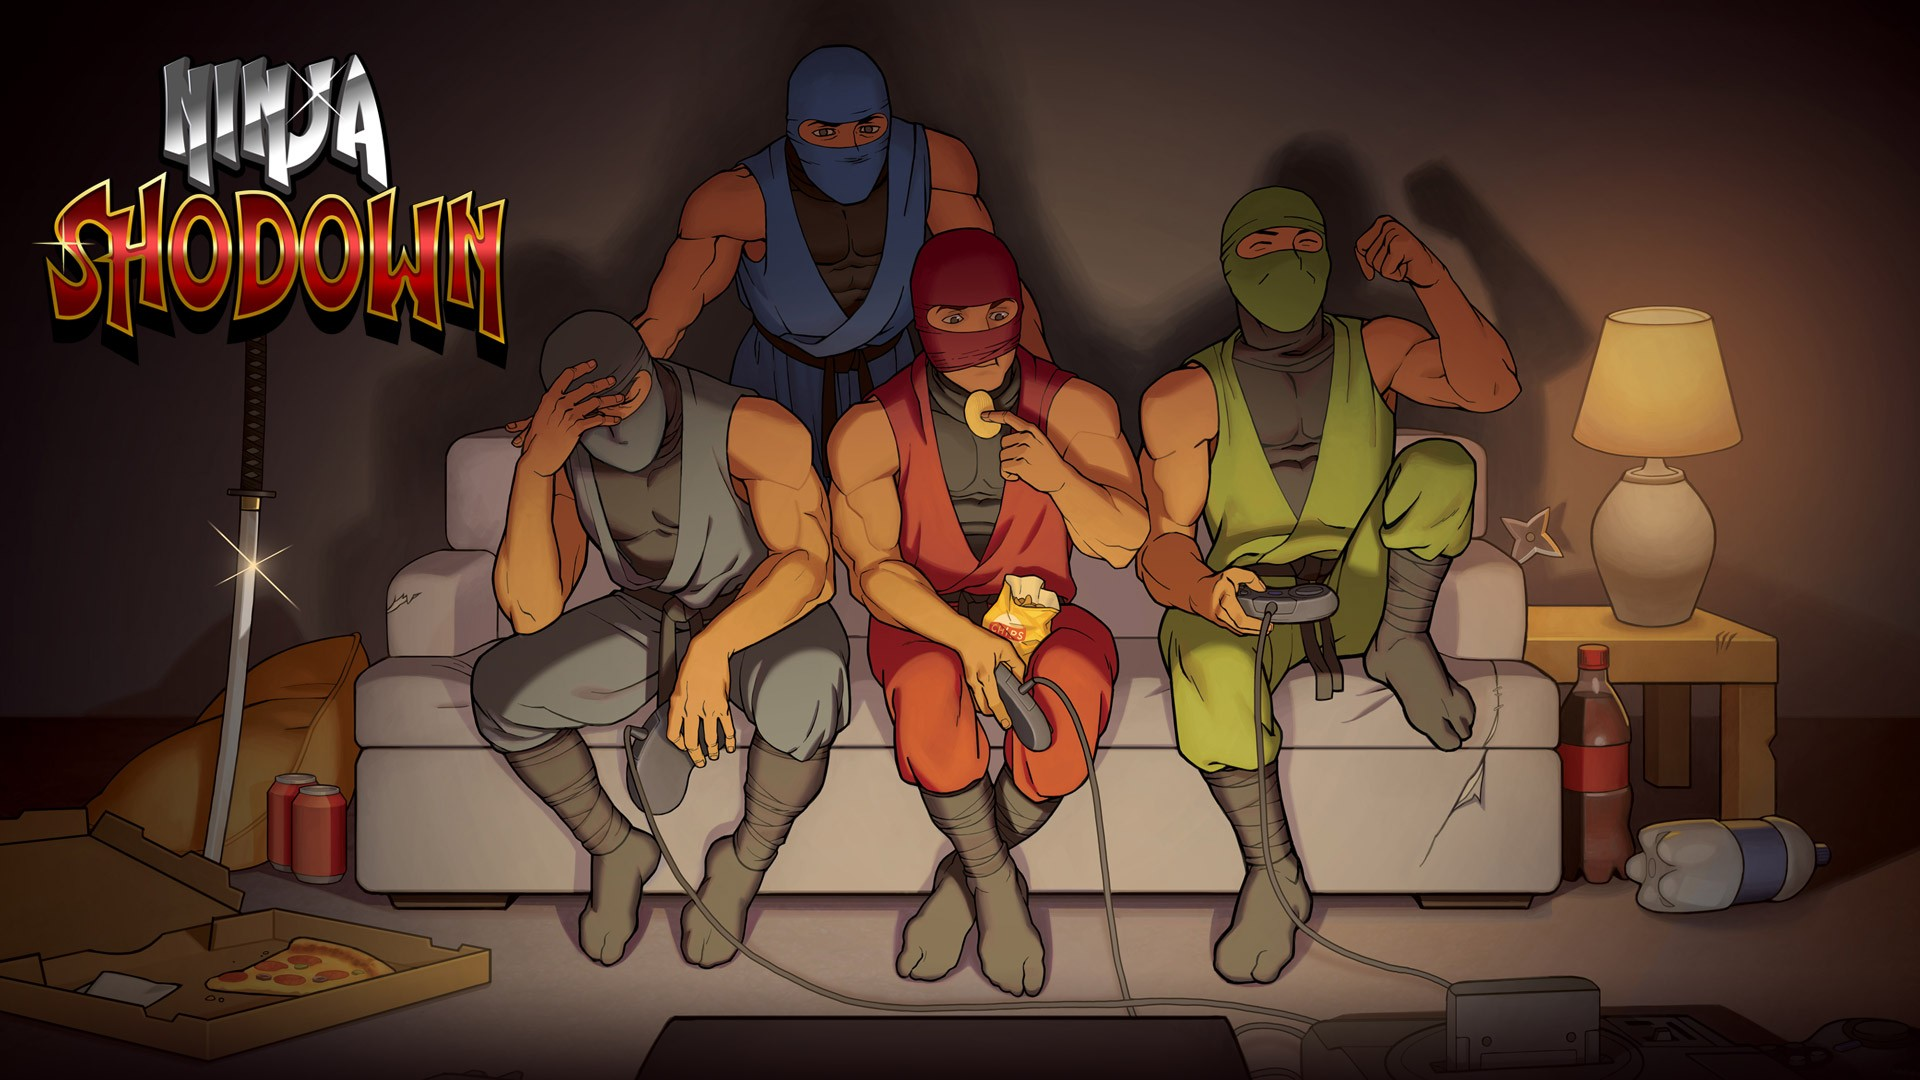 Ninja Shodown_body_1